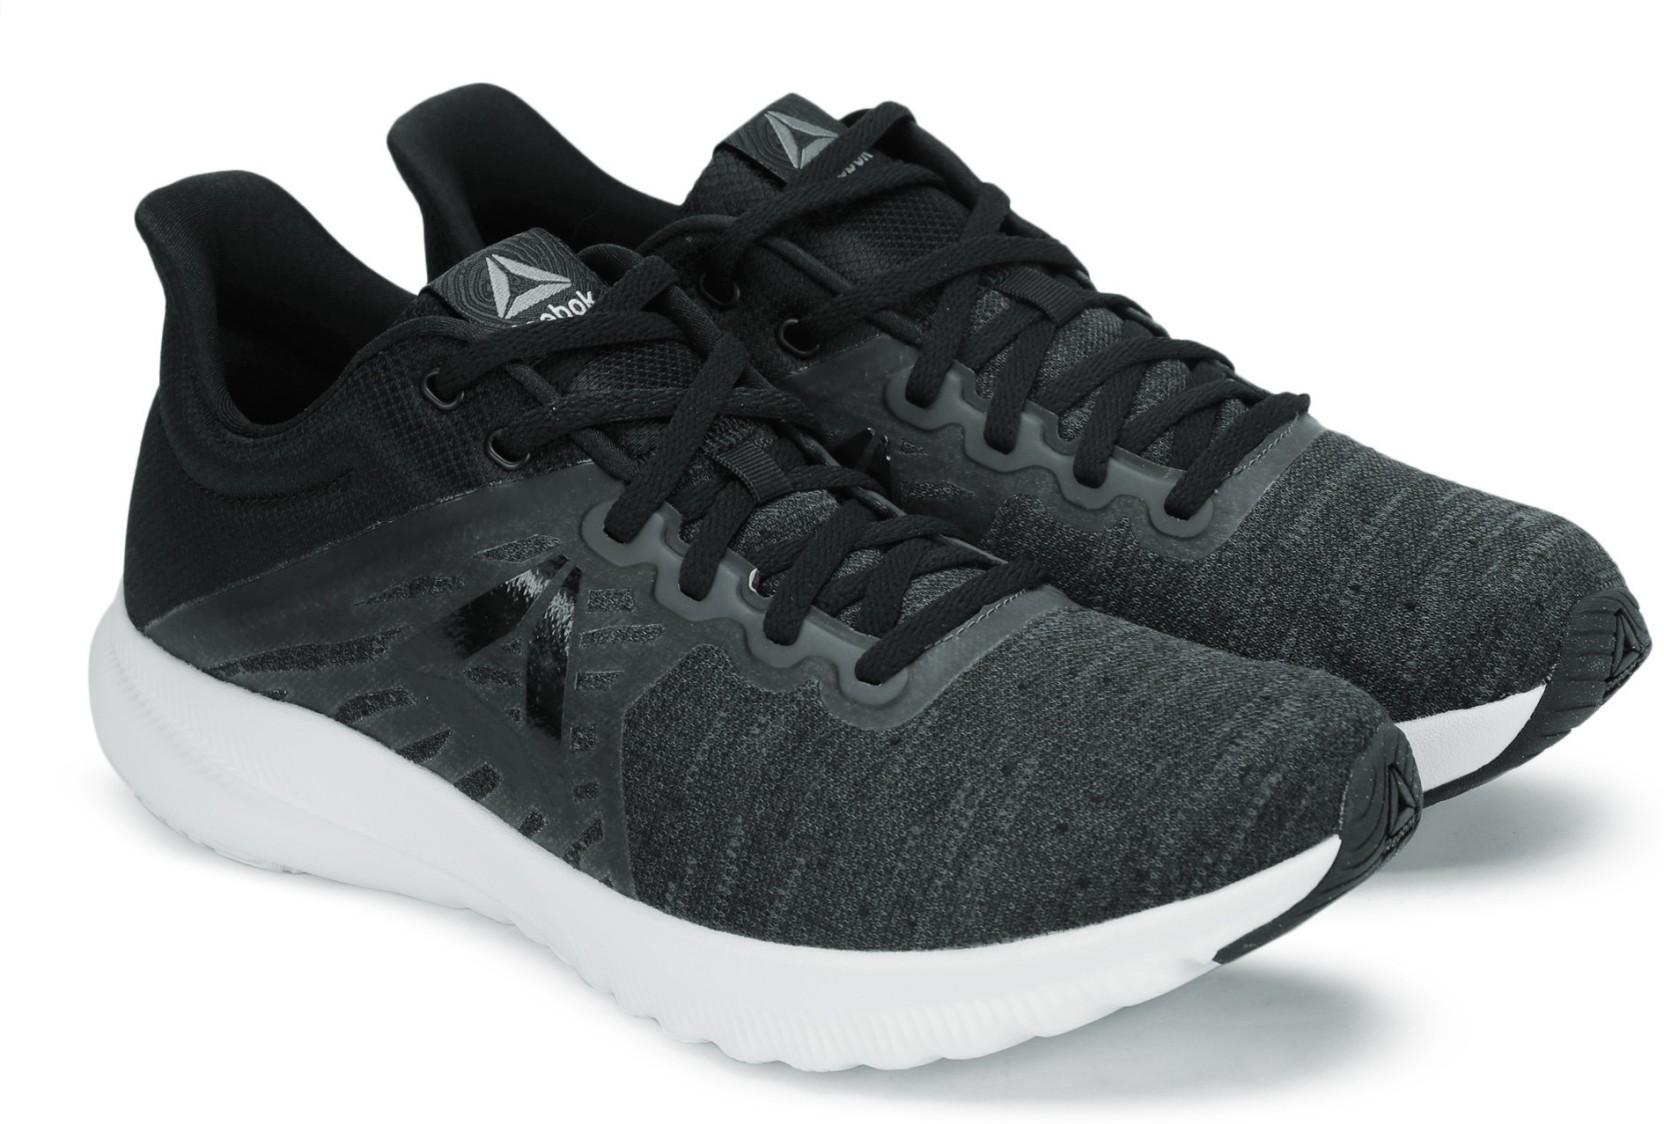 REEBOK OSR DISTANCE 3.0 Running Shoes For Men - Buy BLK GREY WHITE ... 8965b604e